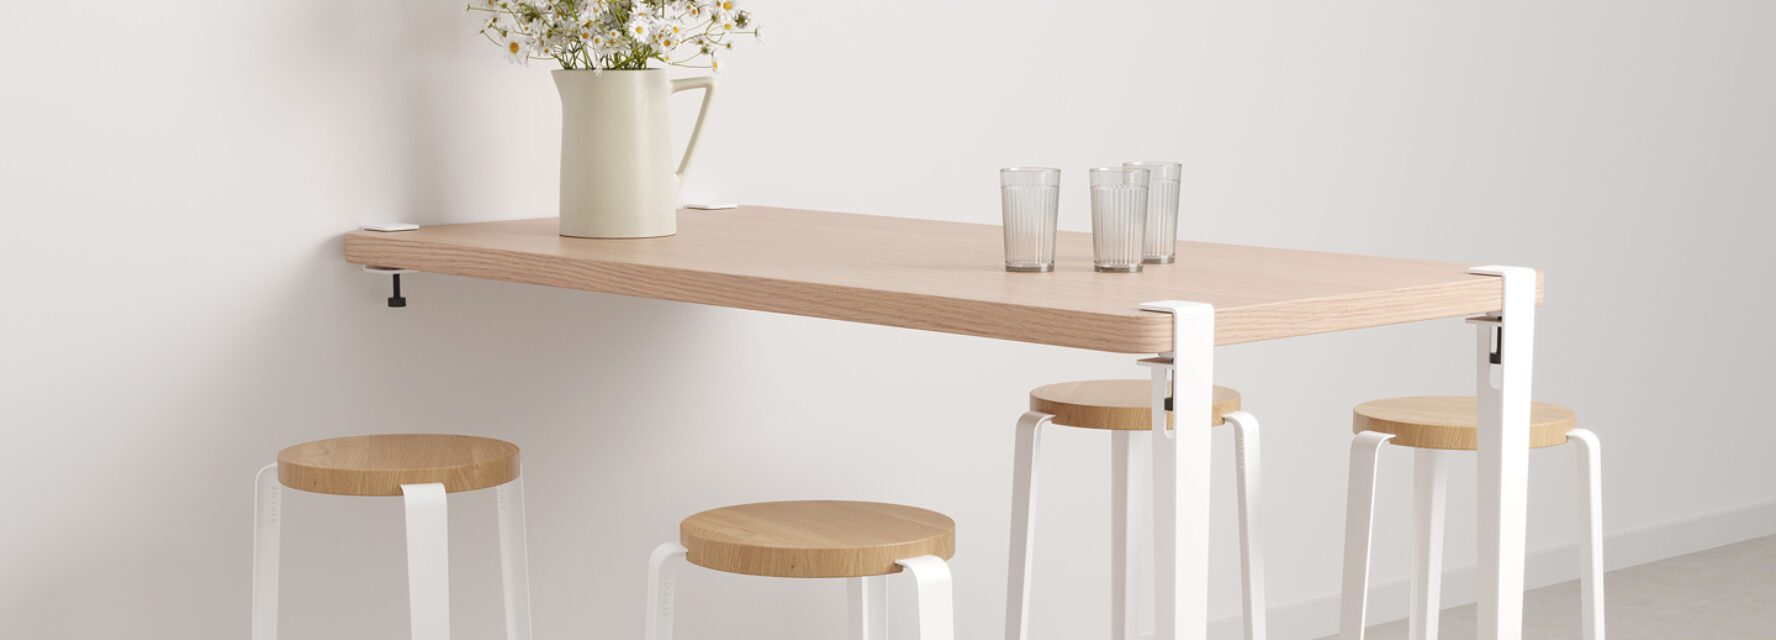 High table legs - TIPTOE